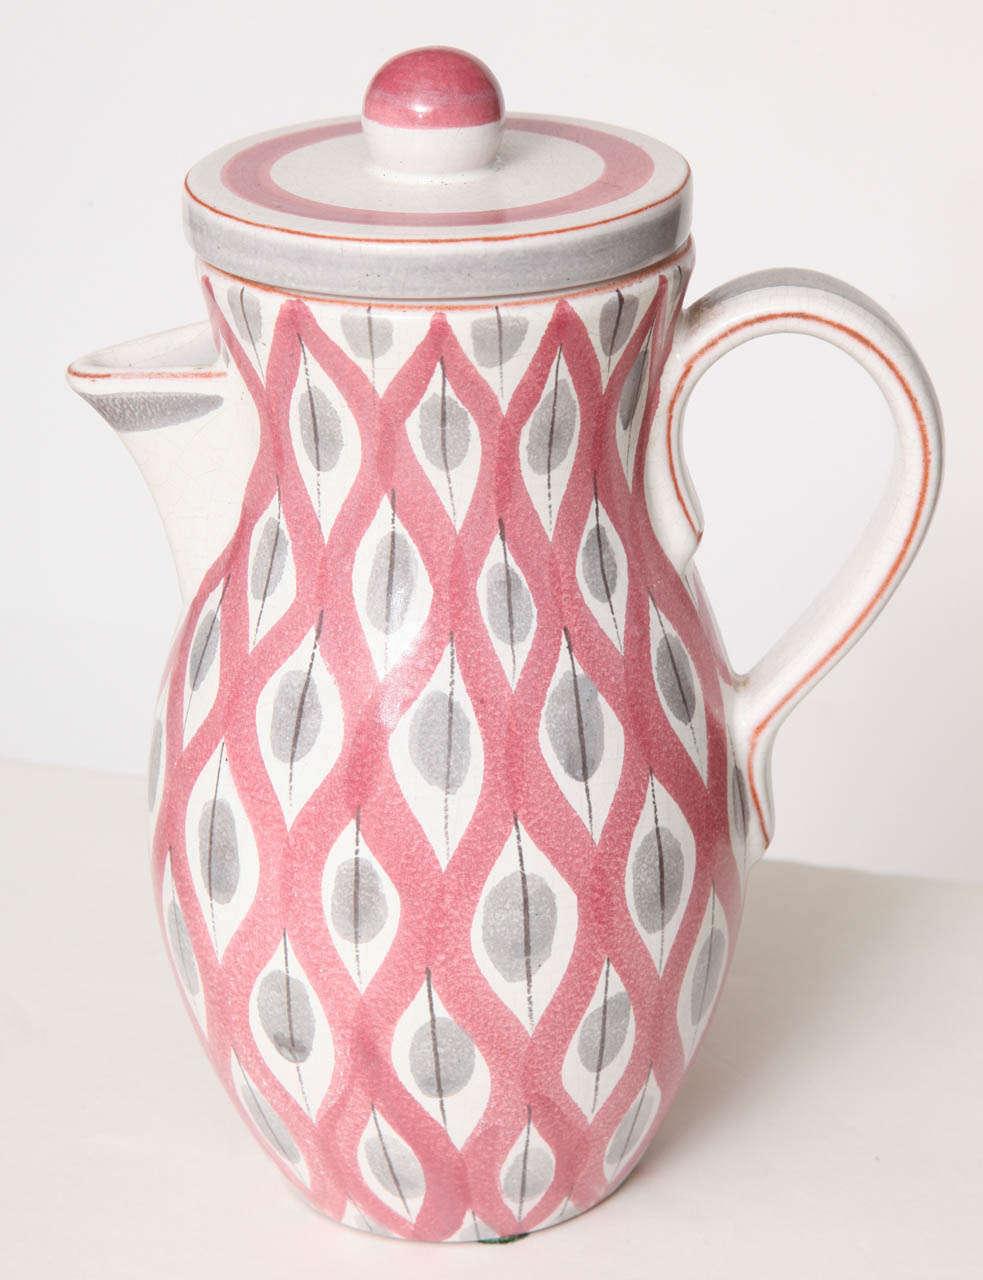 Hand-Crafted Ceramics Bowls by Stig Lindberg, Sweden, circa 1950 For Sale